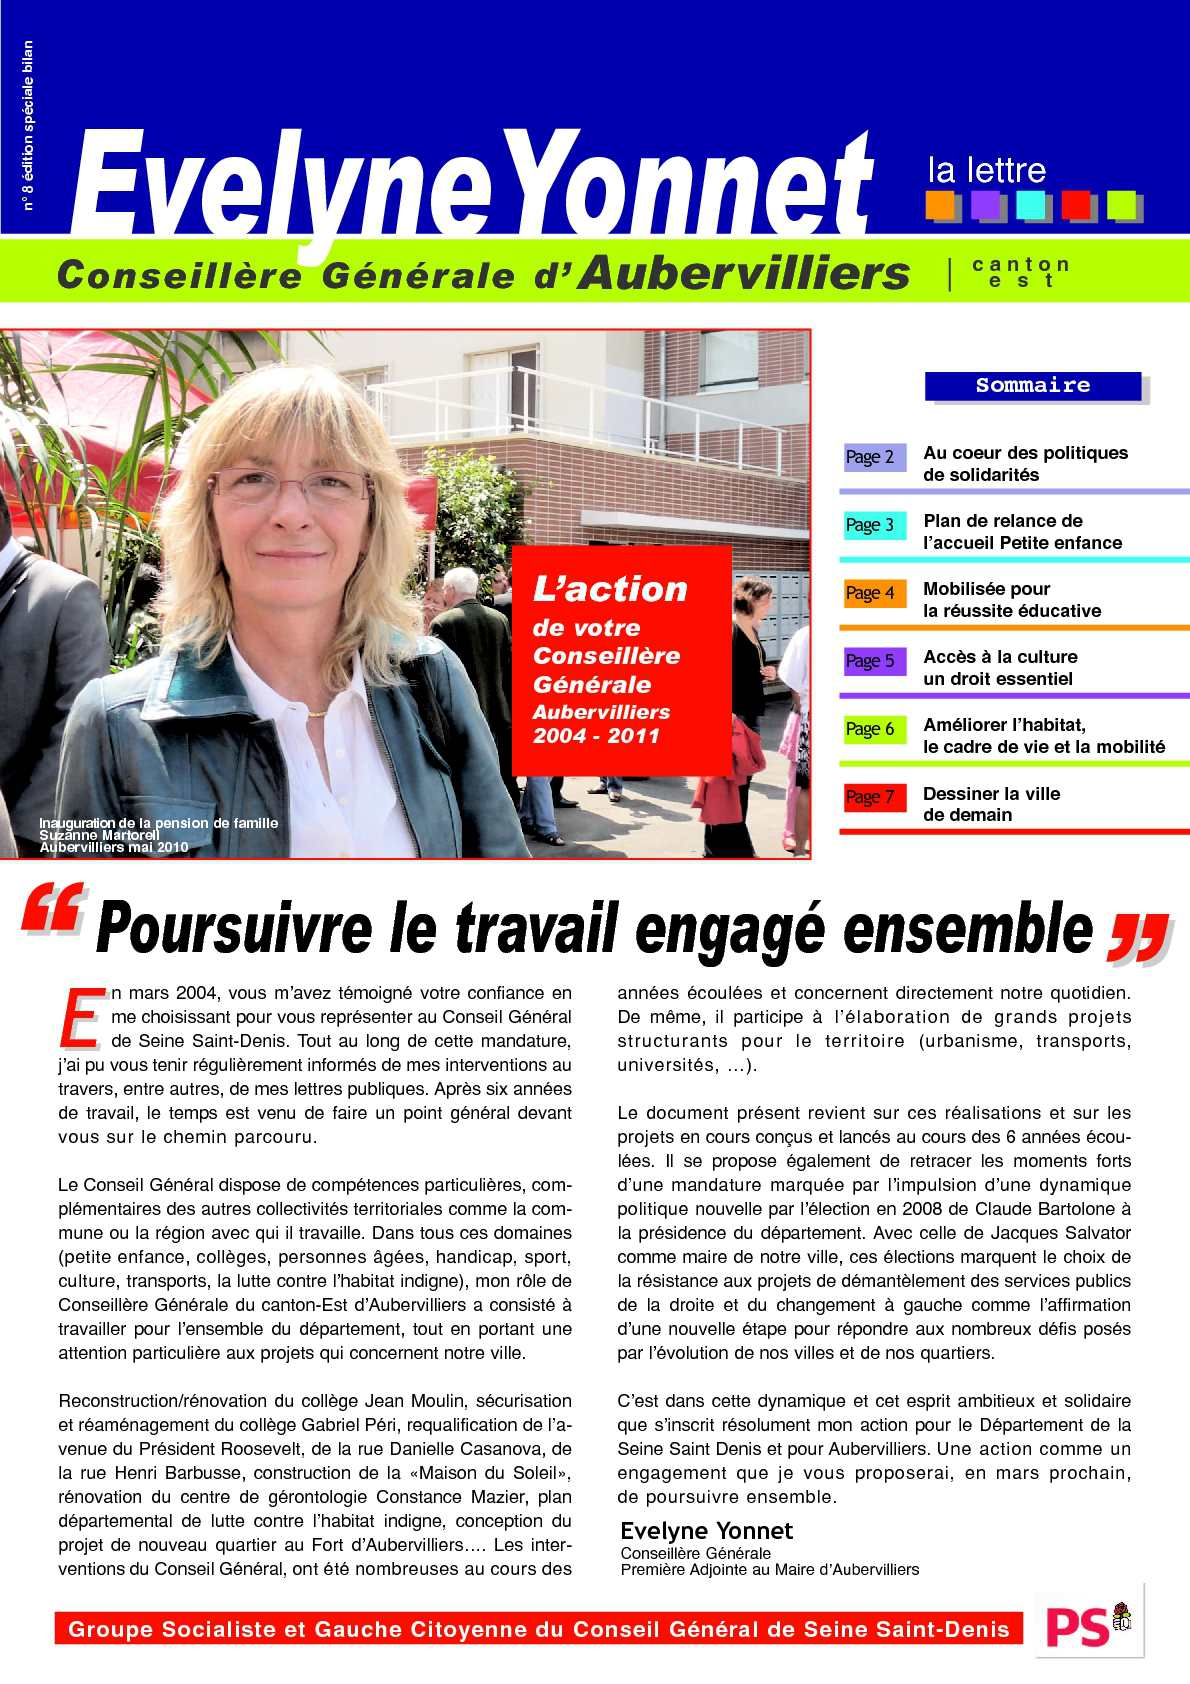 Calaméo pte rendu de mandat 2004 2011 Evelyne Yonnet